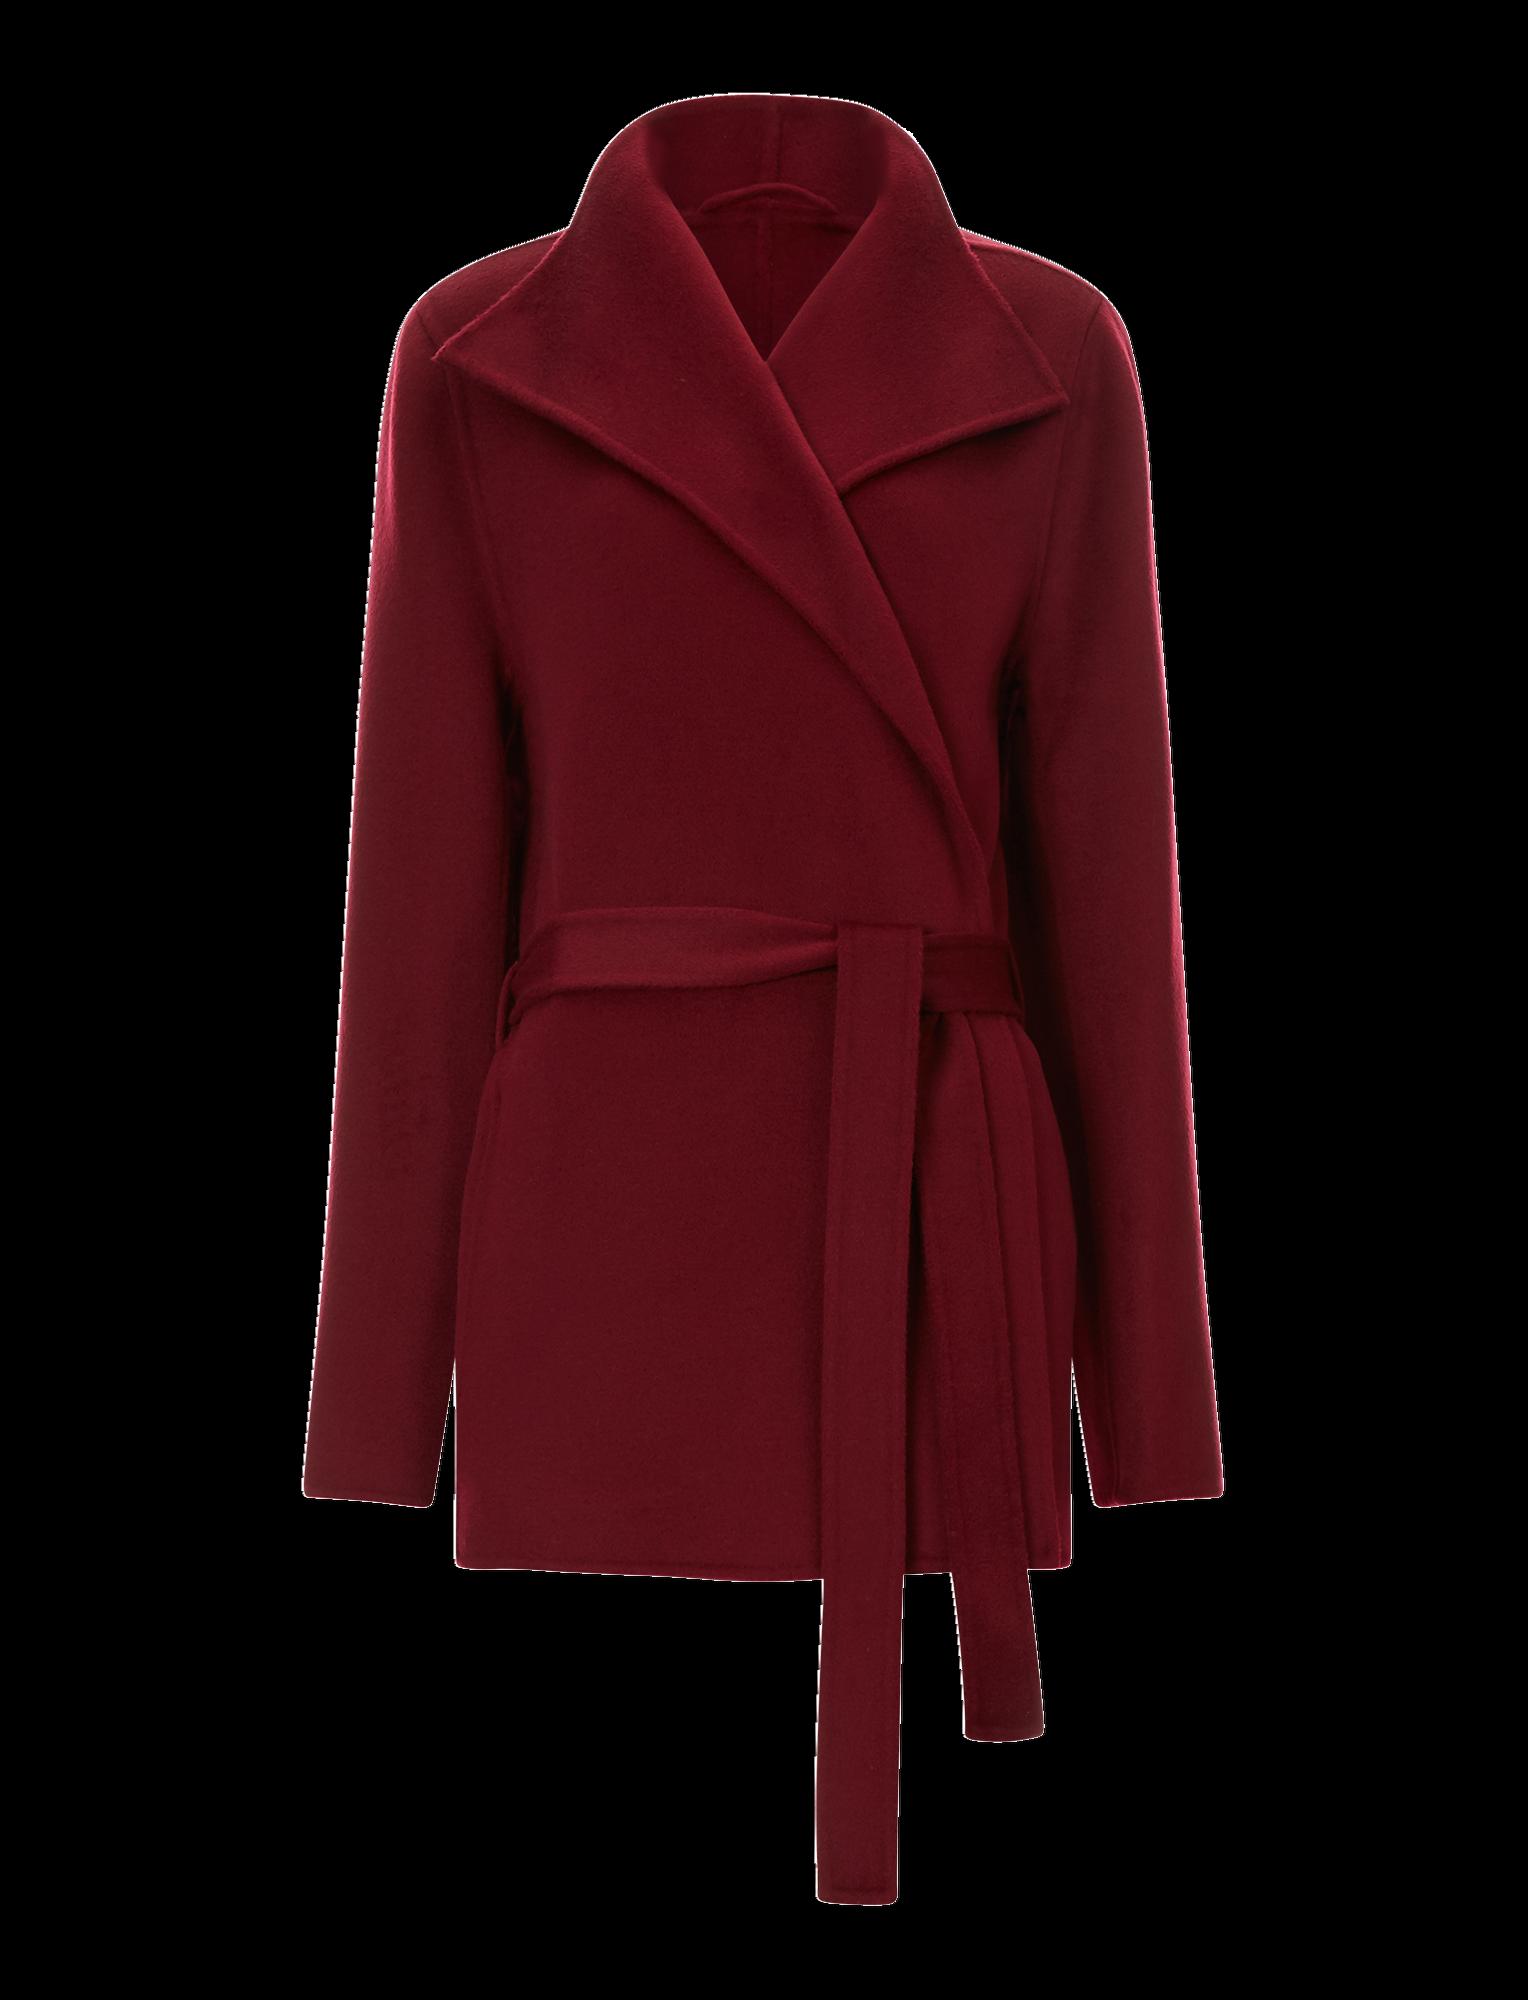 Joseph, Lima Short Double Face Cashmere Coat, in GARNET